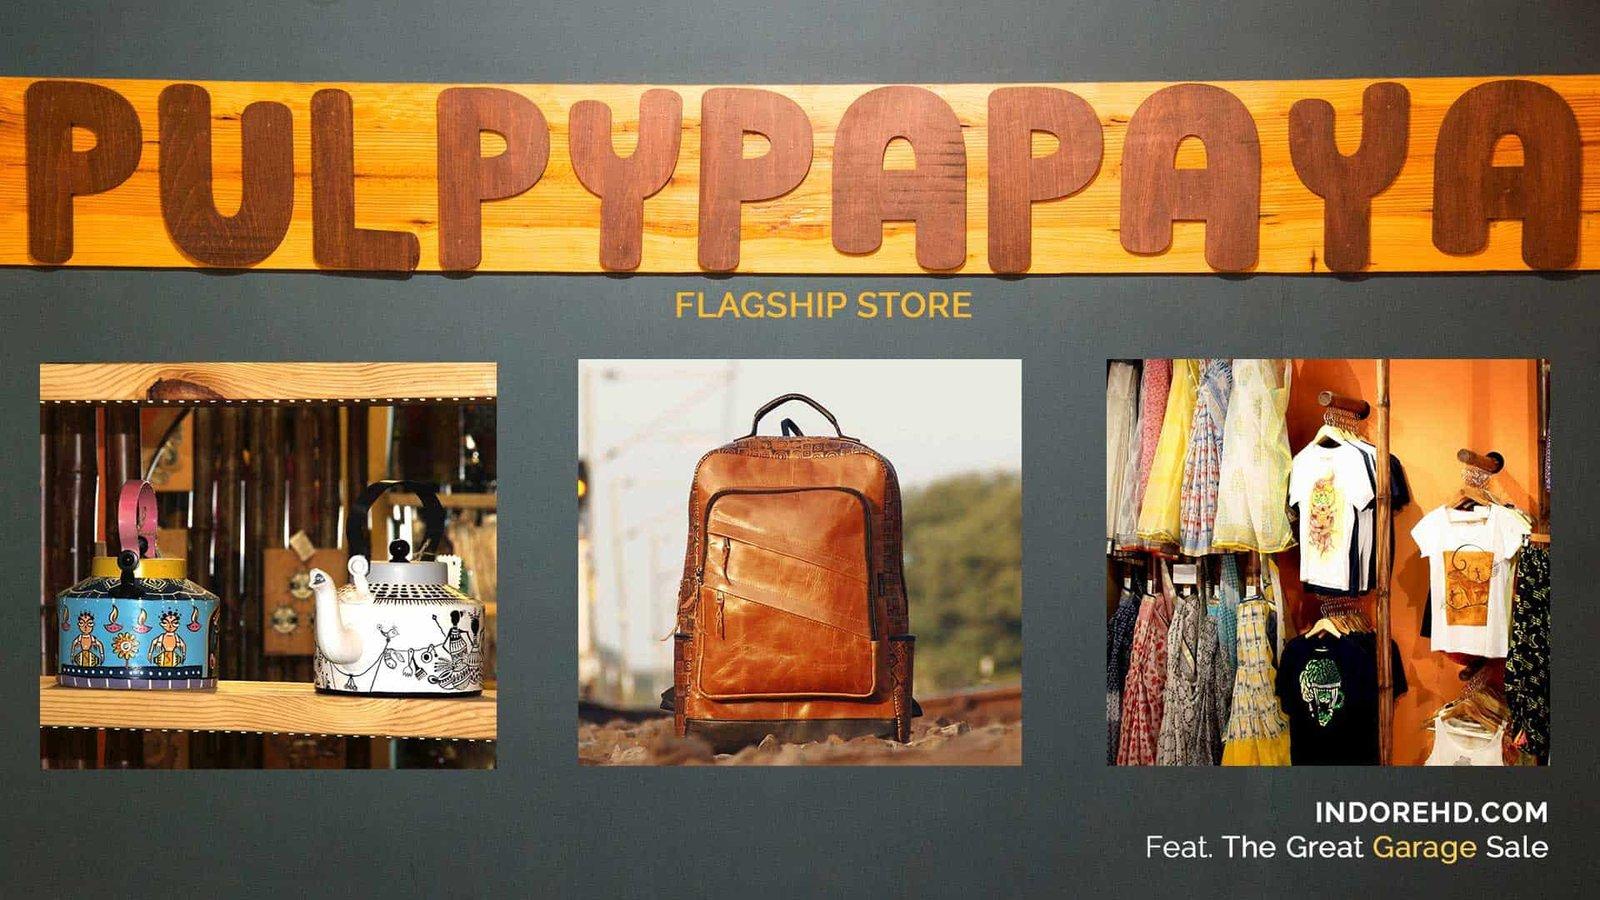 Pulpypapaya-garage-sale-cover-jan17-indoreHD